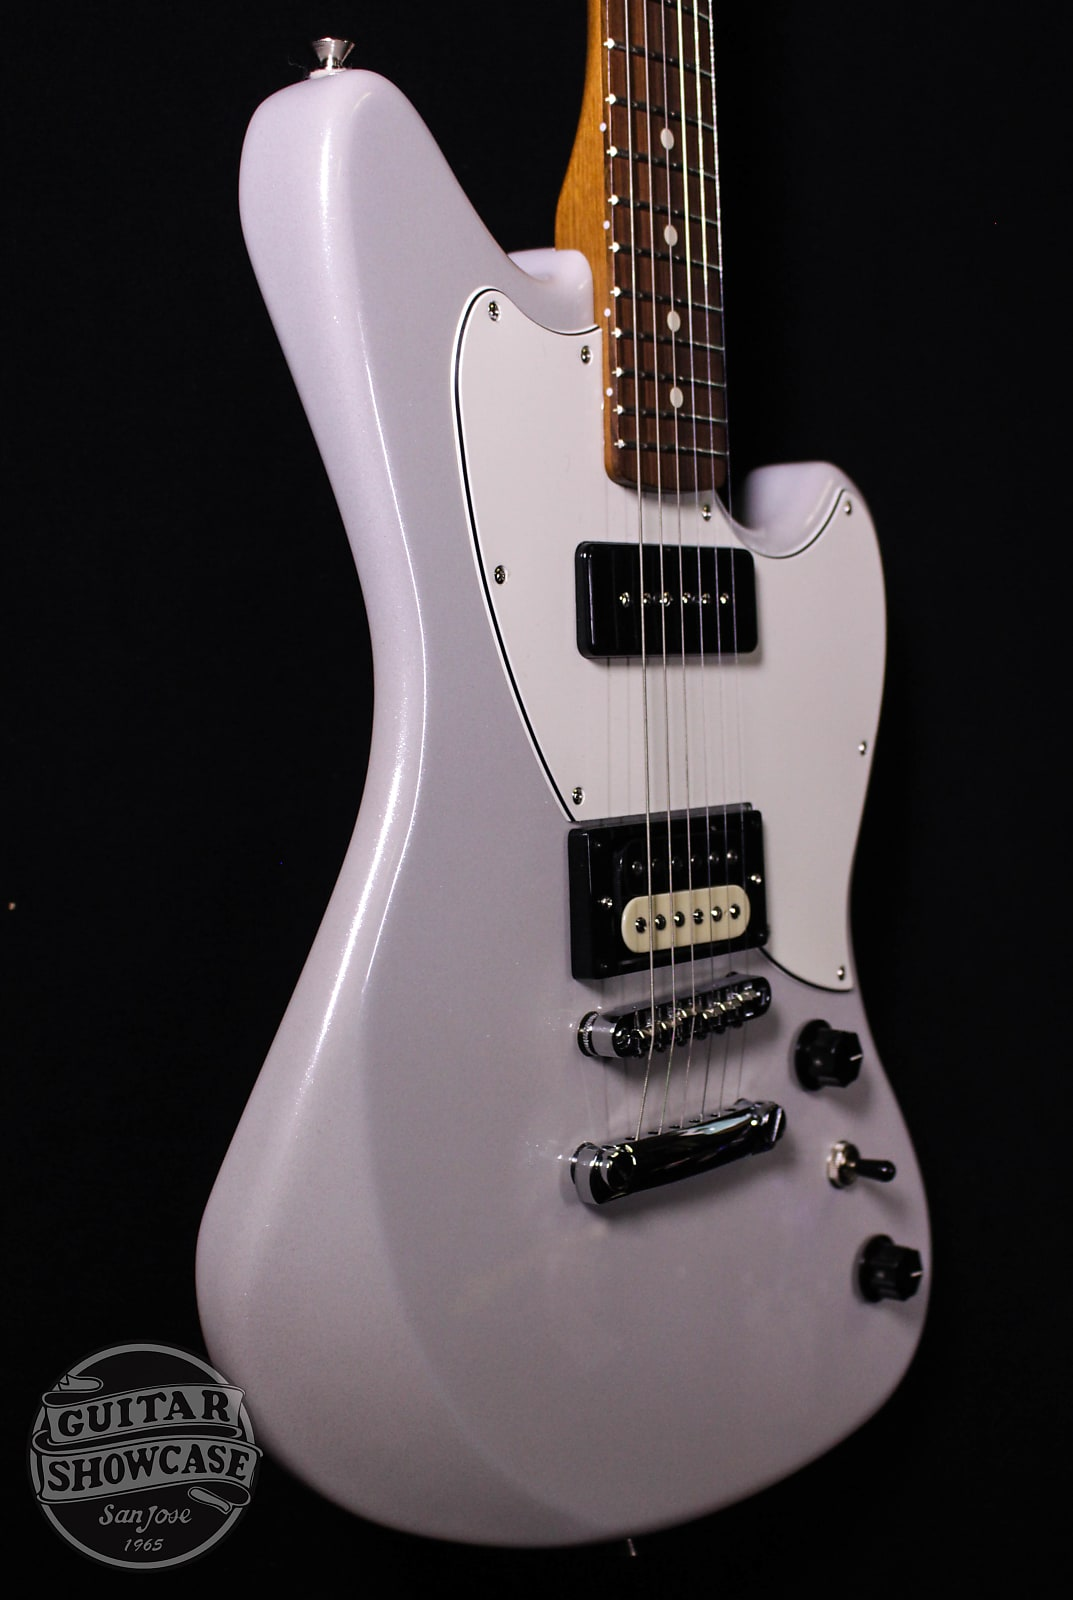 Fender Alternate Reality Series Powercaster with Pau Ferro Fretboard 2019 White Opal